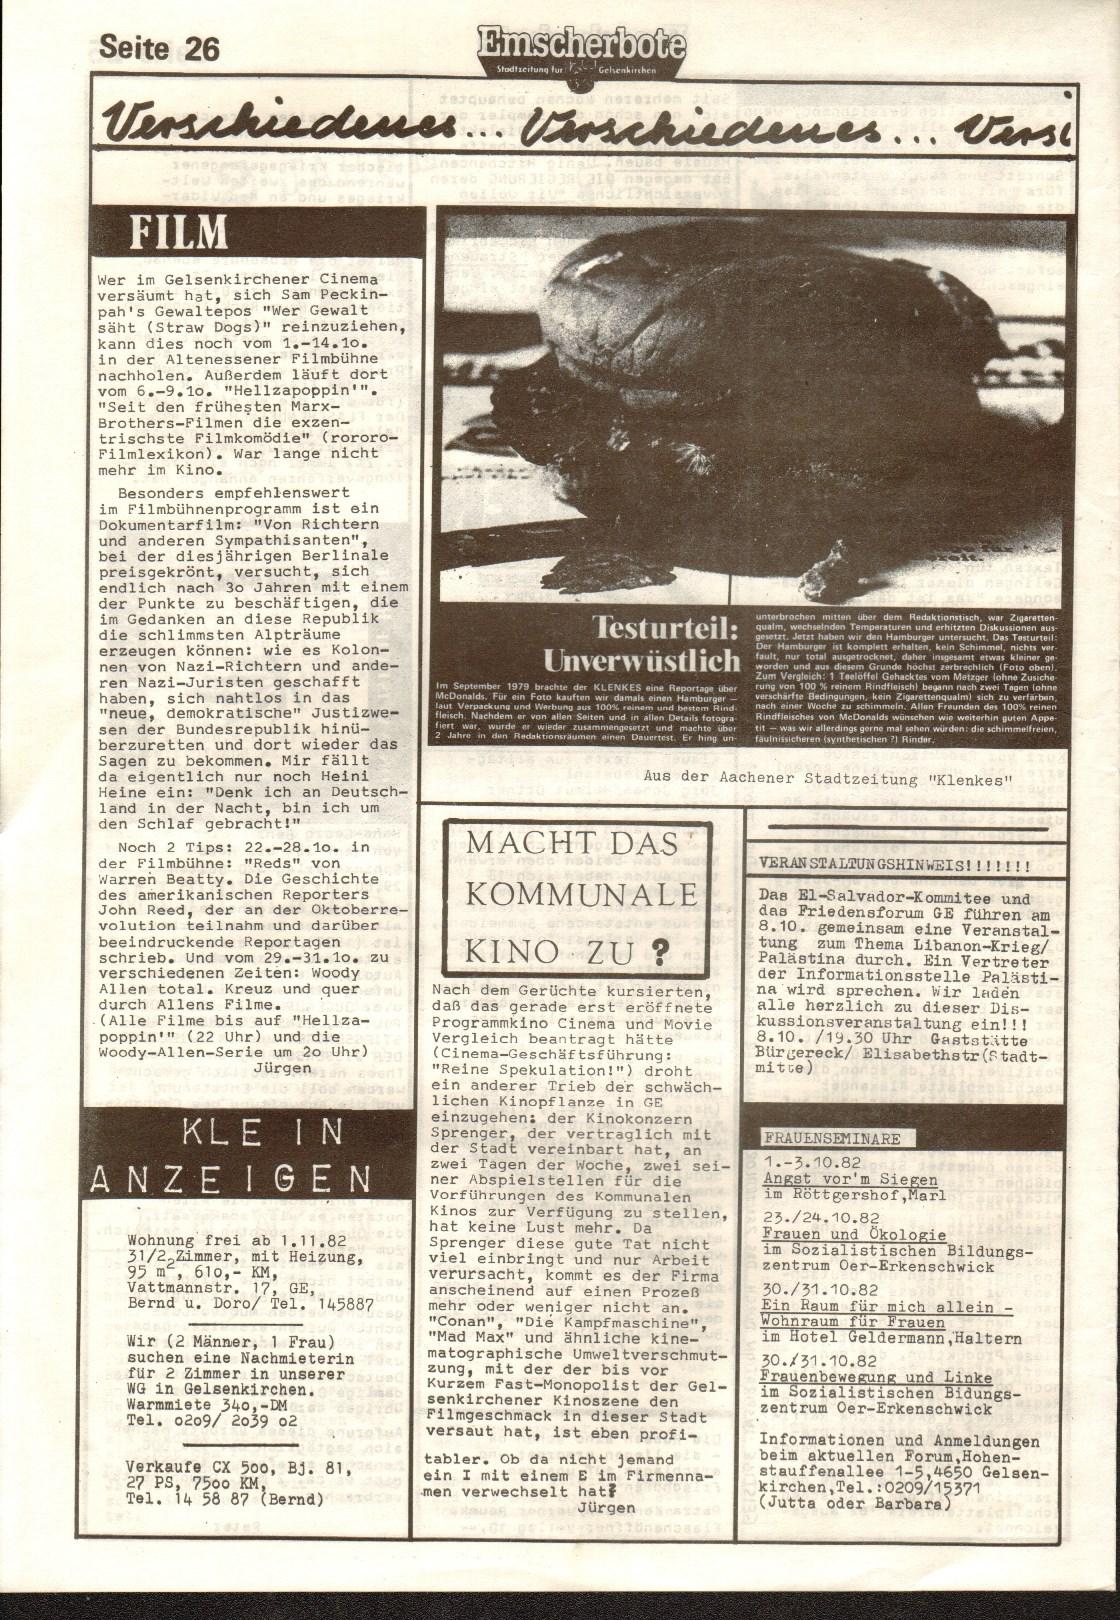 Gelsenkirchen_Emscherbote_1982_21_26